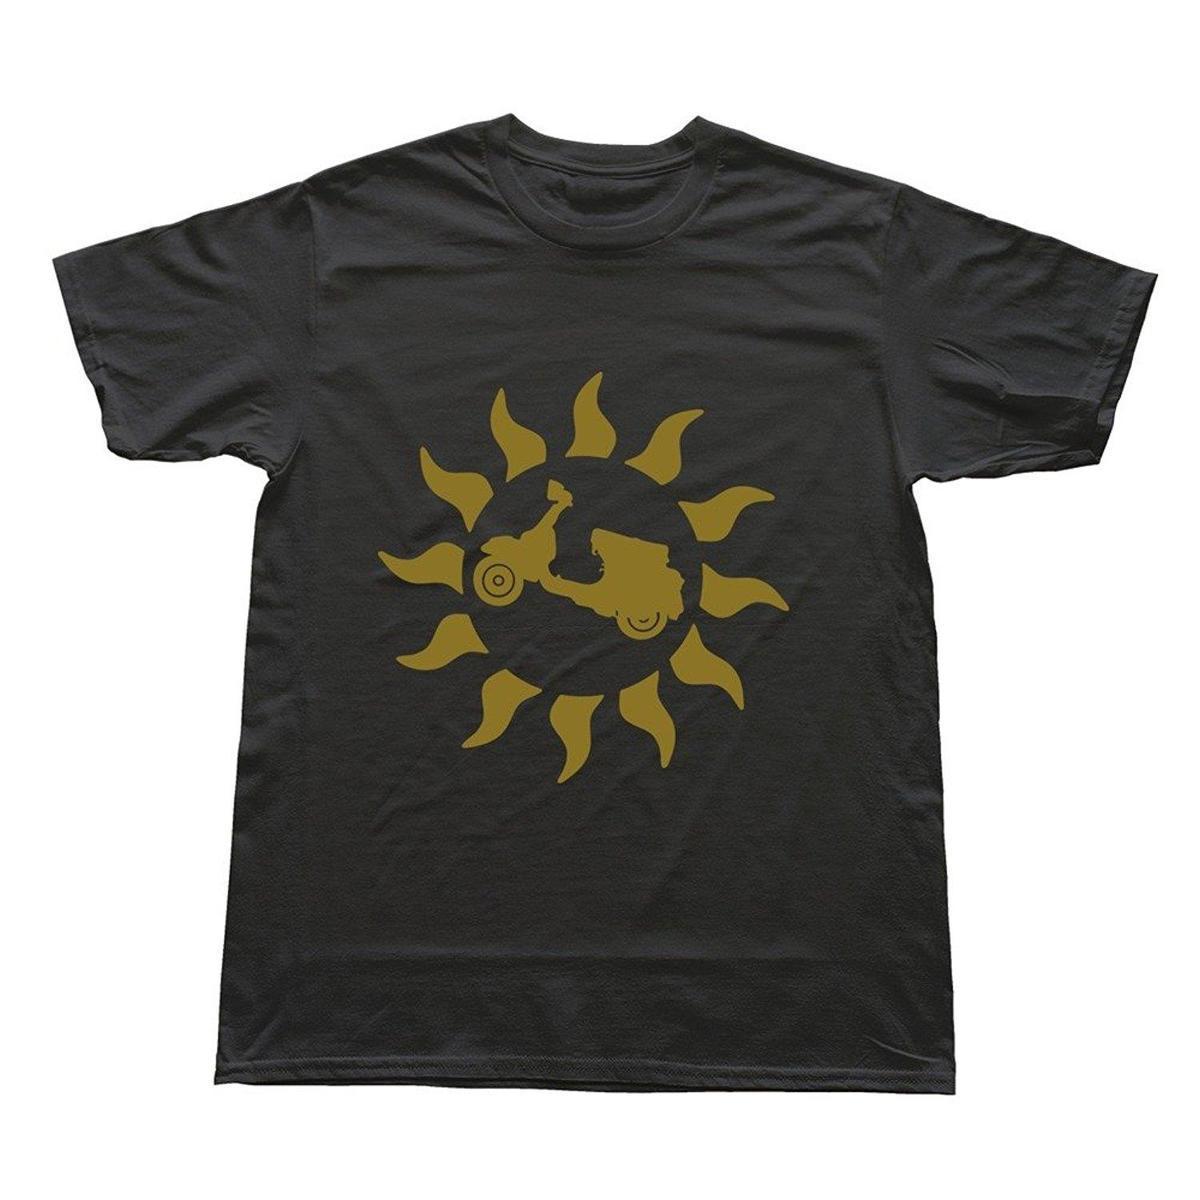 807a44428 Compre Camiseta YESZXC Masculina Vespa Sun G1 T Preto De Liguo0051, $12.79    Pt.Dhgate.Com